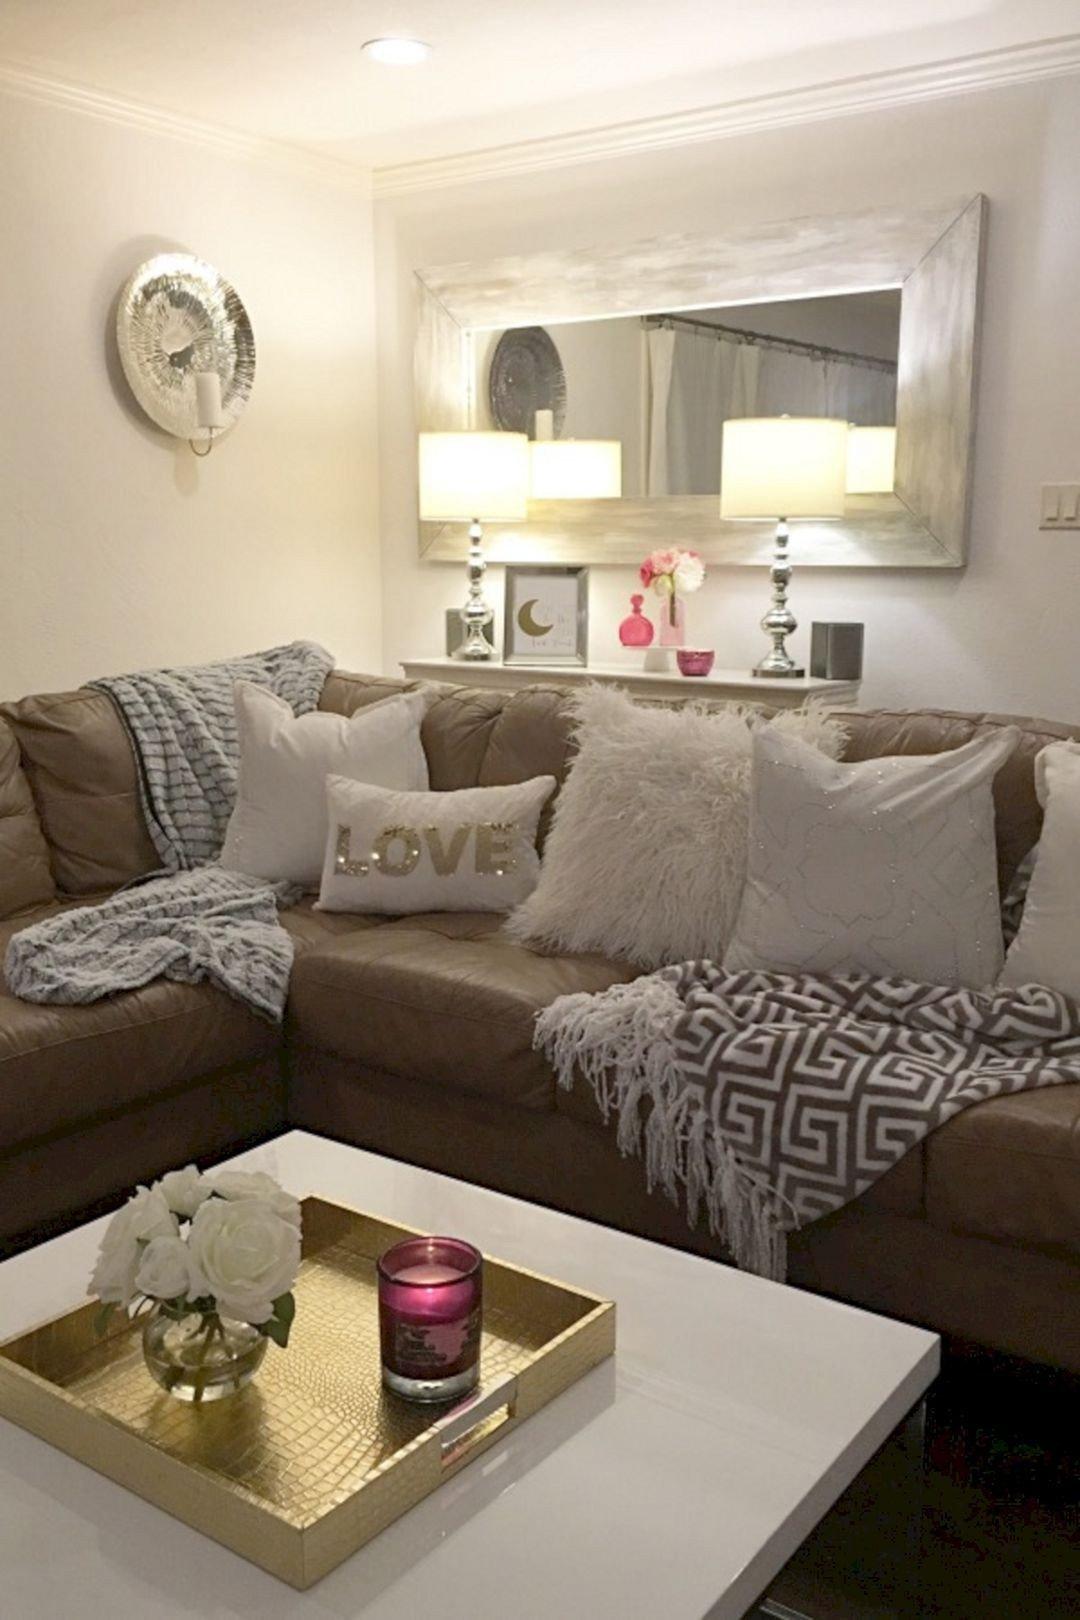 Cozy Small Living Room Ideas Perfect and Cozy Small Living Room Design 8 De Agz